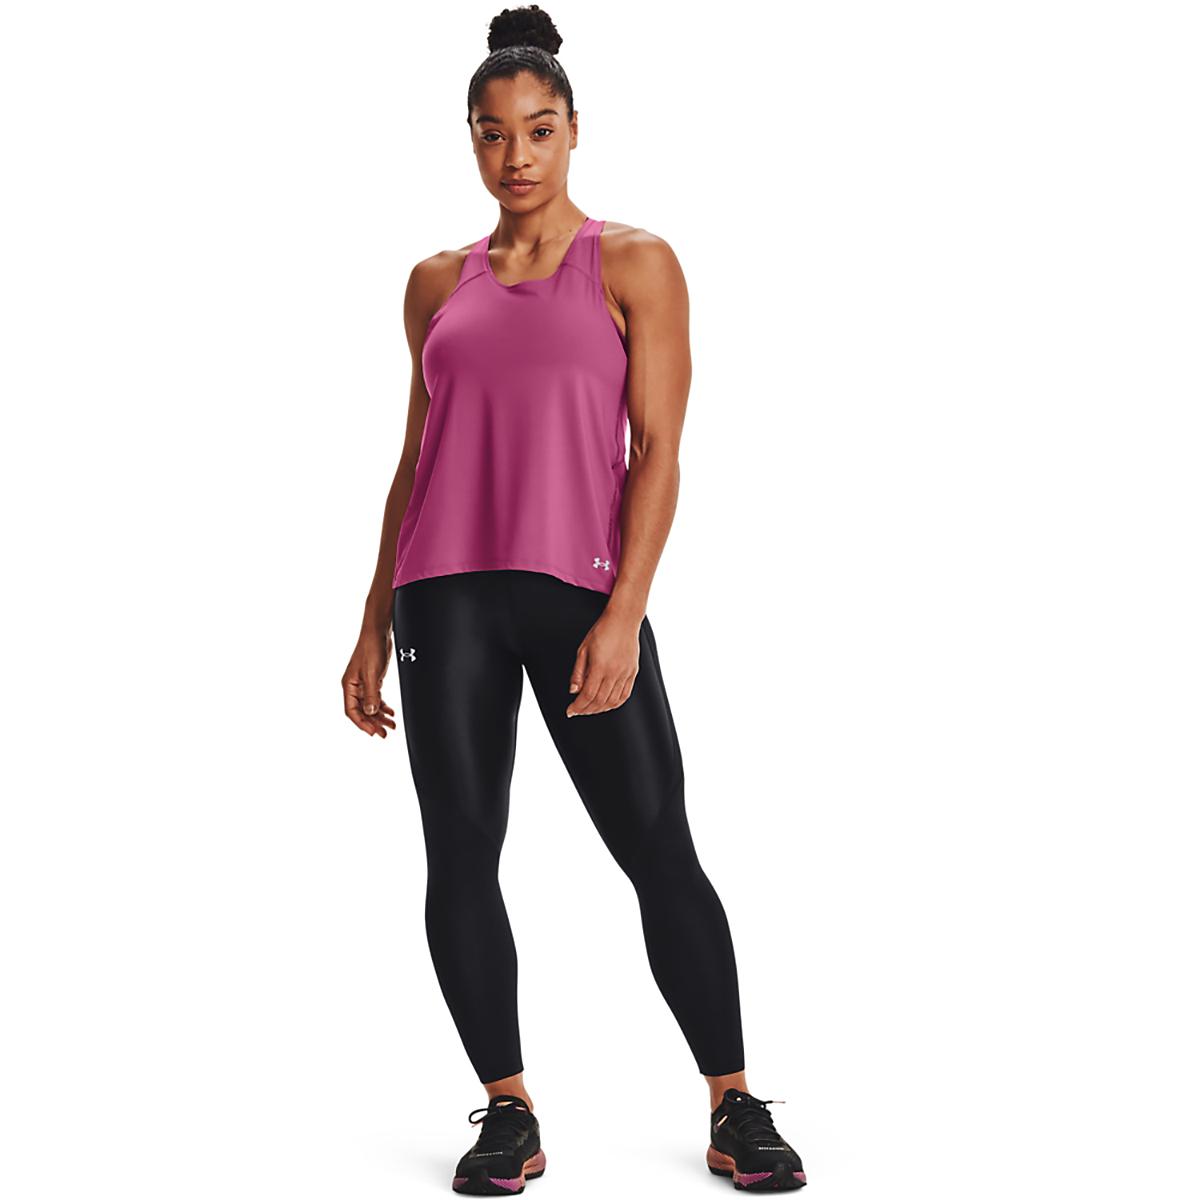 Women's Under Armour Iso-Chill Run 200 Tank - Color: Pink Quartz - Size: XS, Pink Quartz, large, image 1